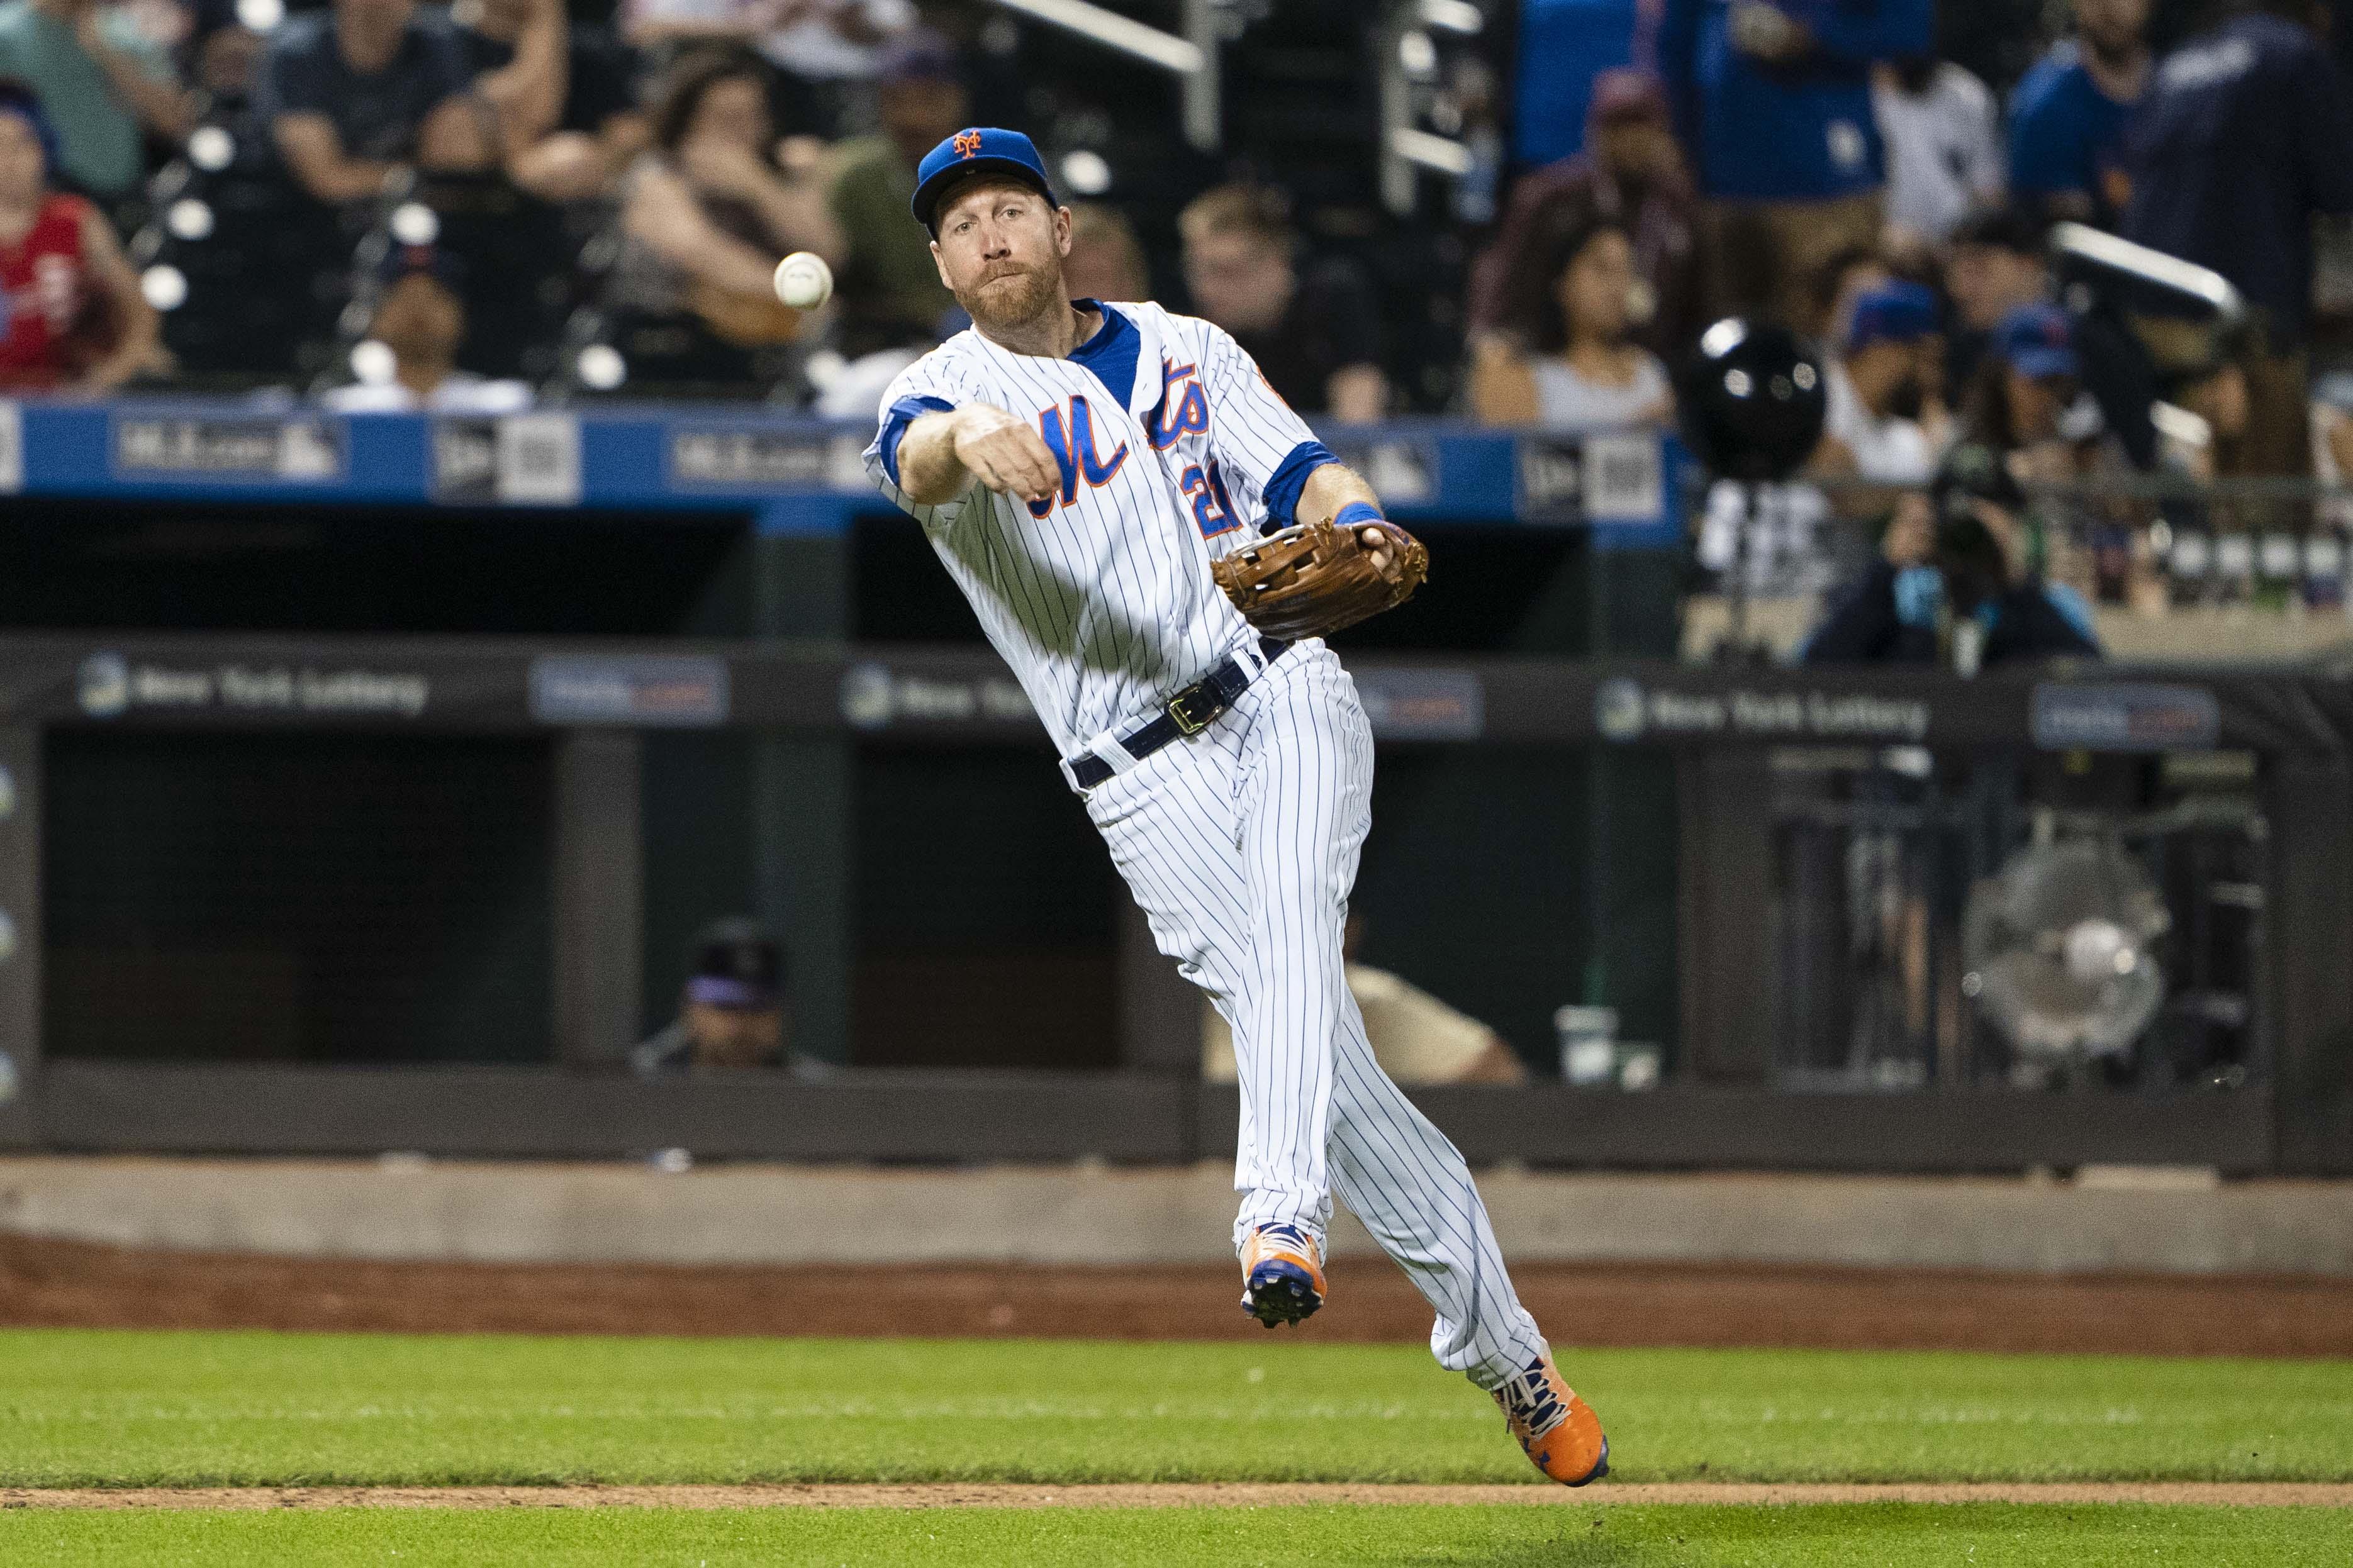 6/9/19 Game Preview: Colorado Rockies at New York Mets